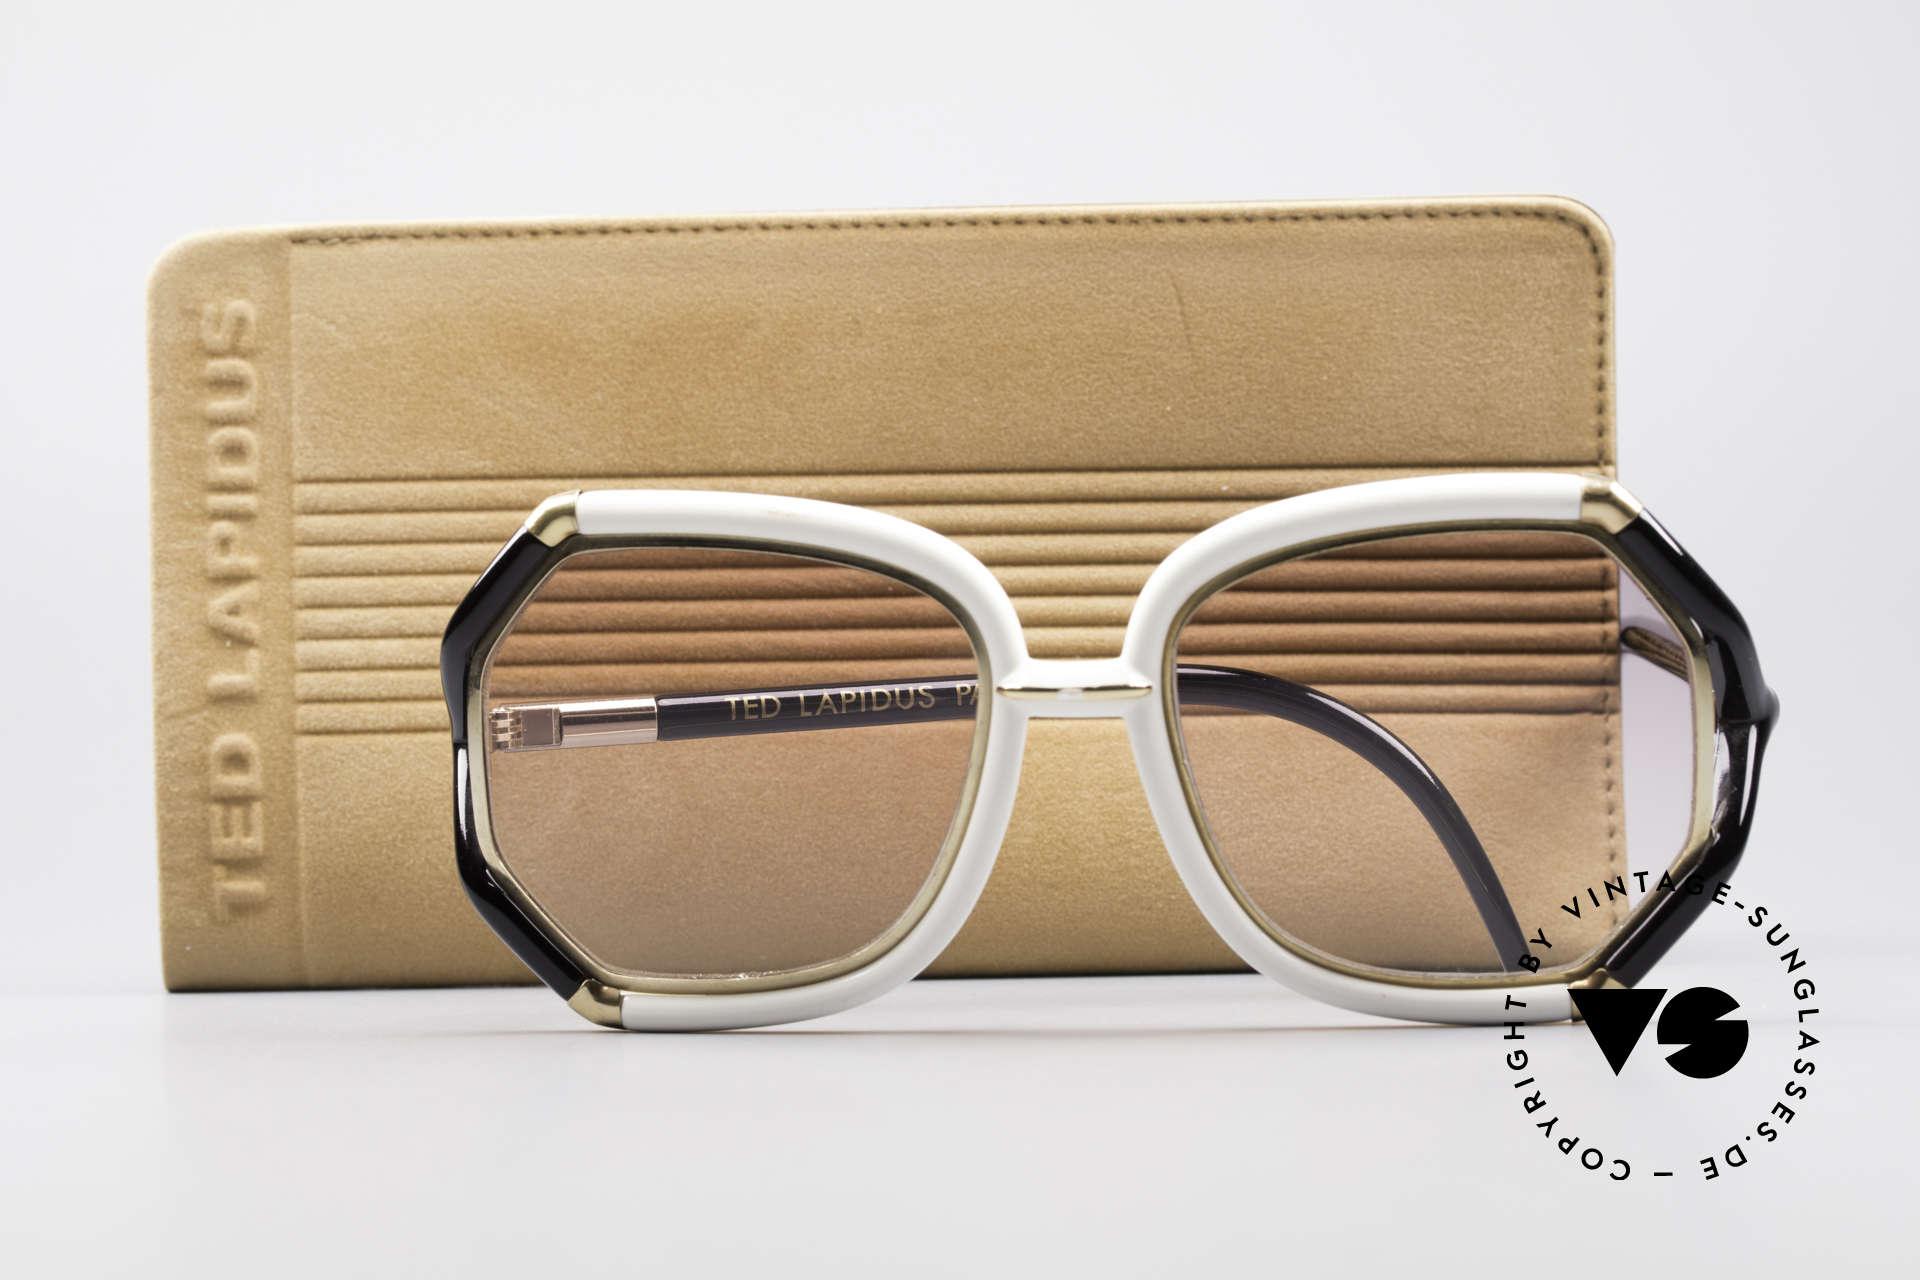 Ted Lapidus B02 70's Designer Sunglasses, NO retro oversize design, but a 40 years old original, Made for Women